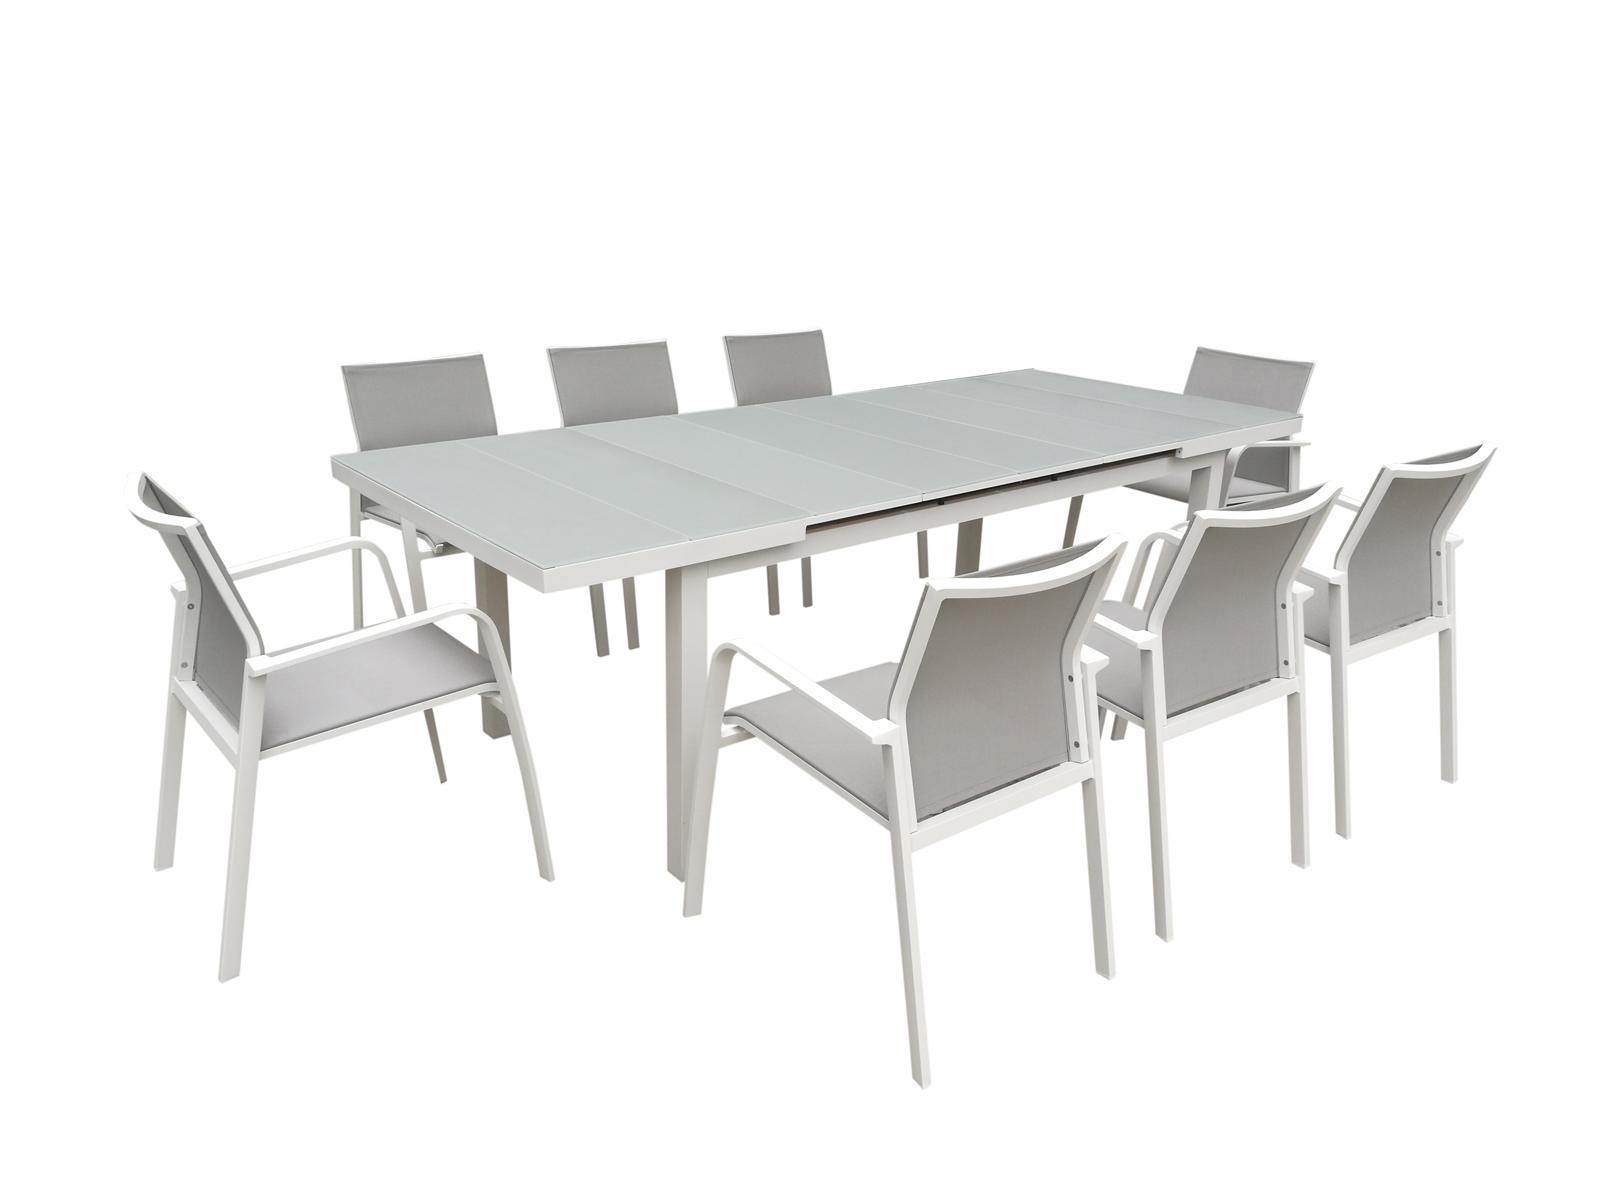 Table De Jardin Extensible Nice 180 240cm En Aluminium Blanc Gris